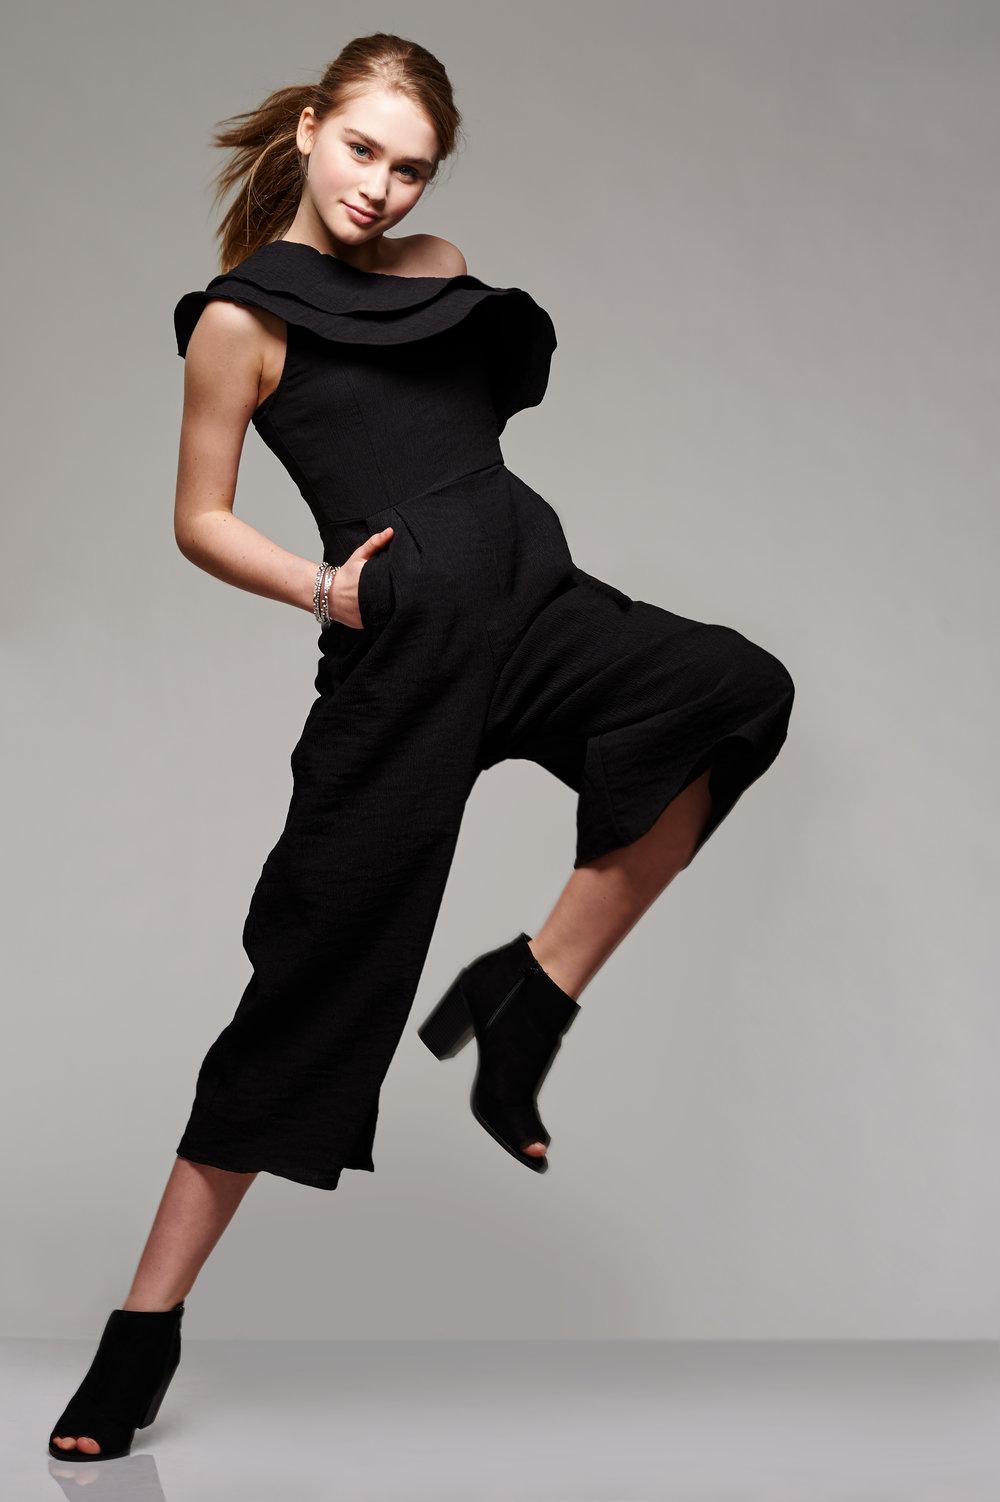 Marta-Hewson-Rachel-Rycho-Model-Portfolio-54418.jpg